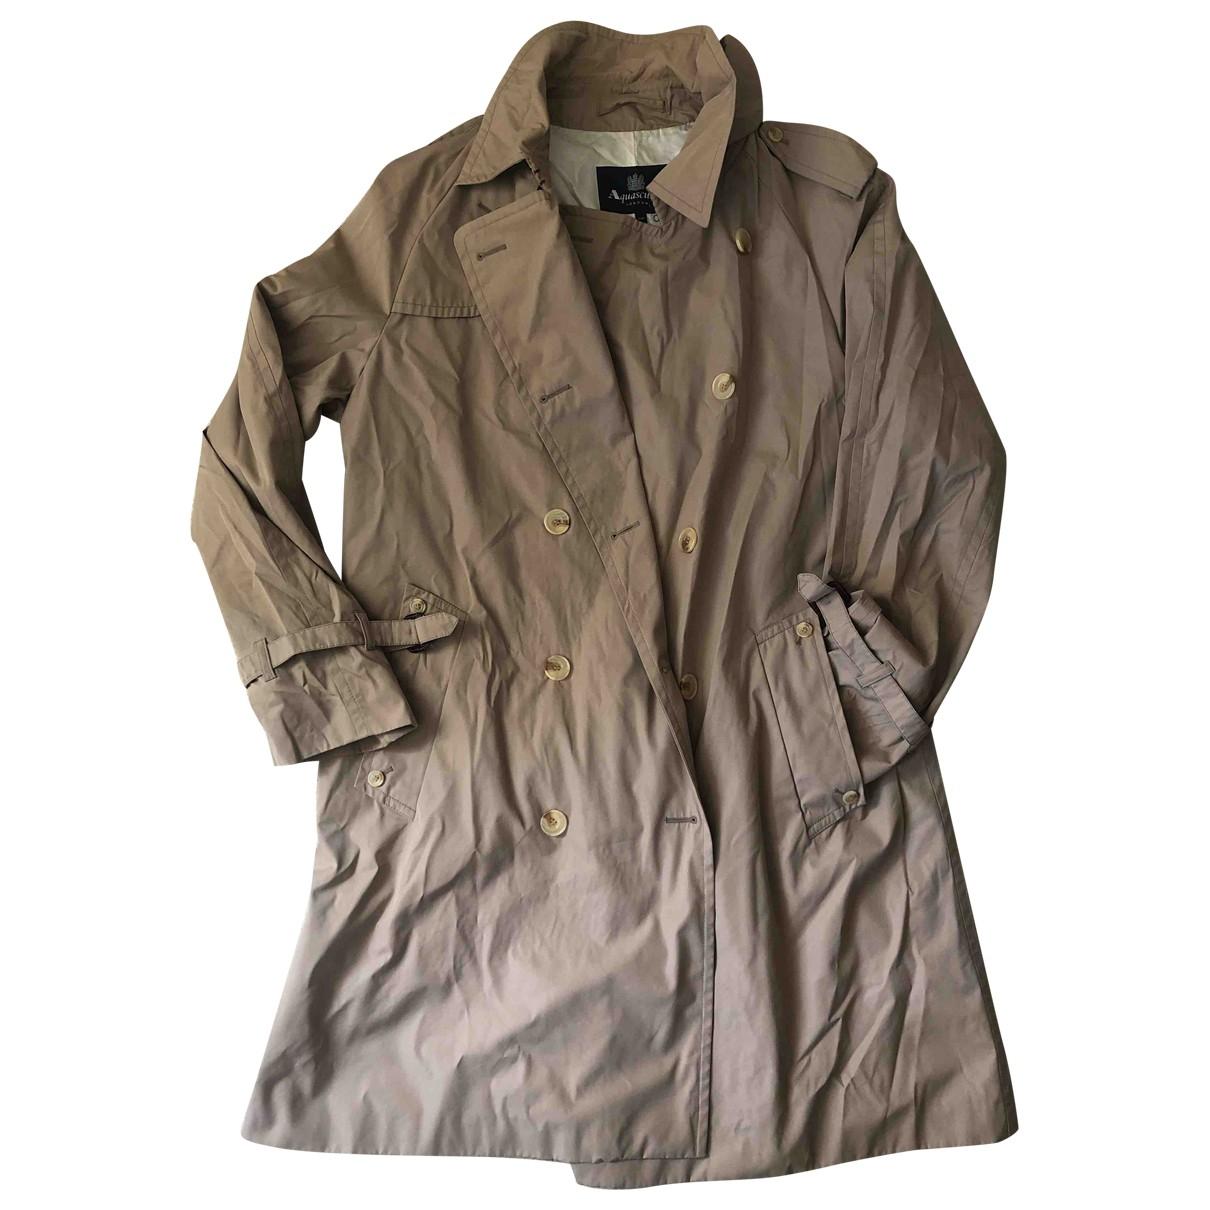 Aquascutum \N Beige coat  for Men 44 UK - US